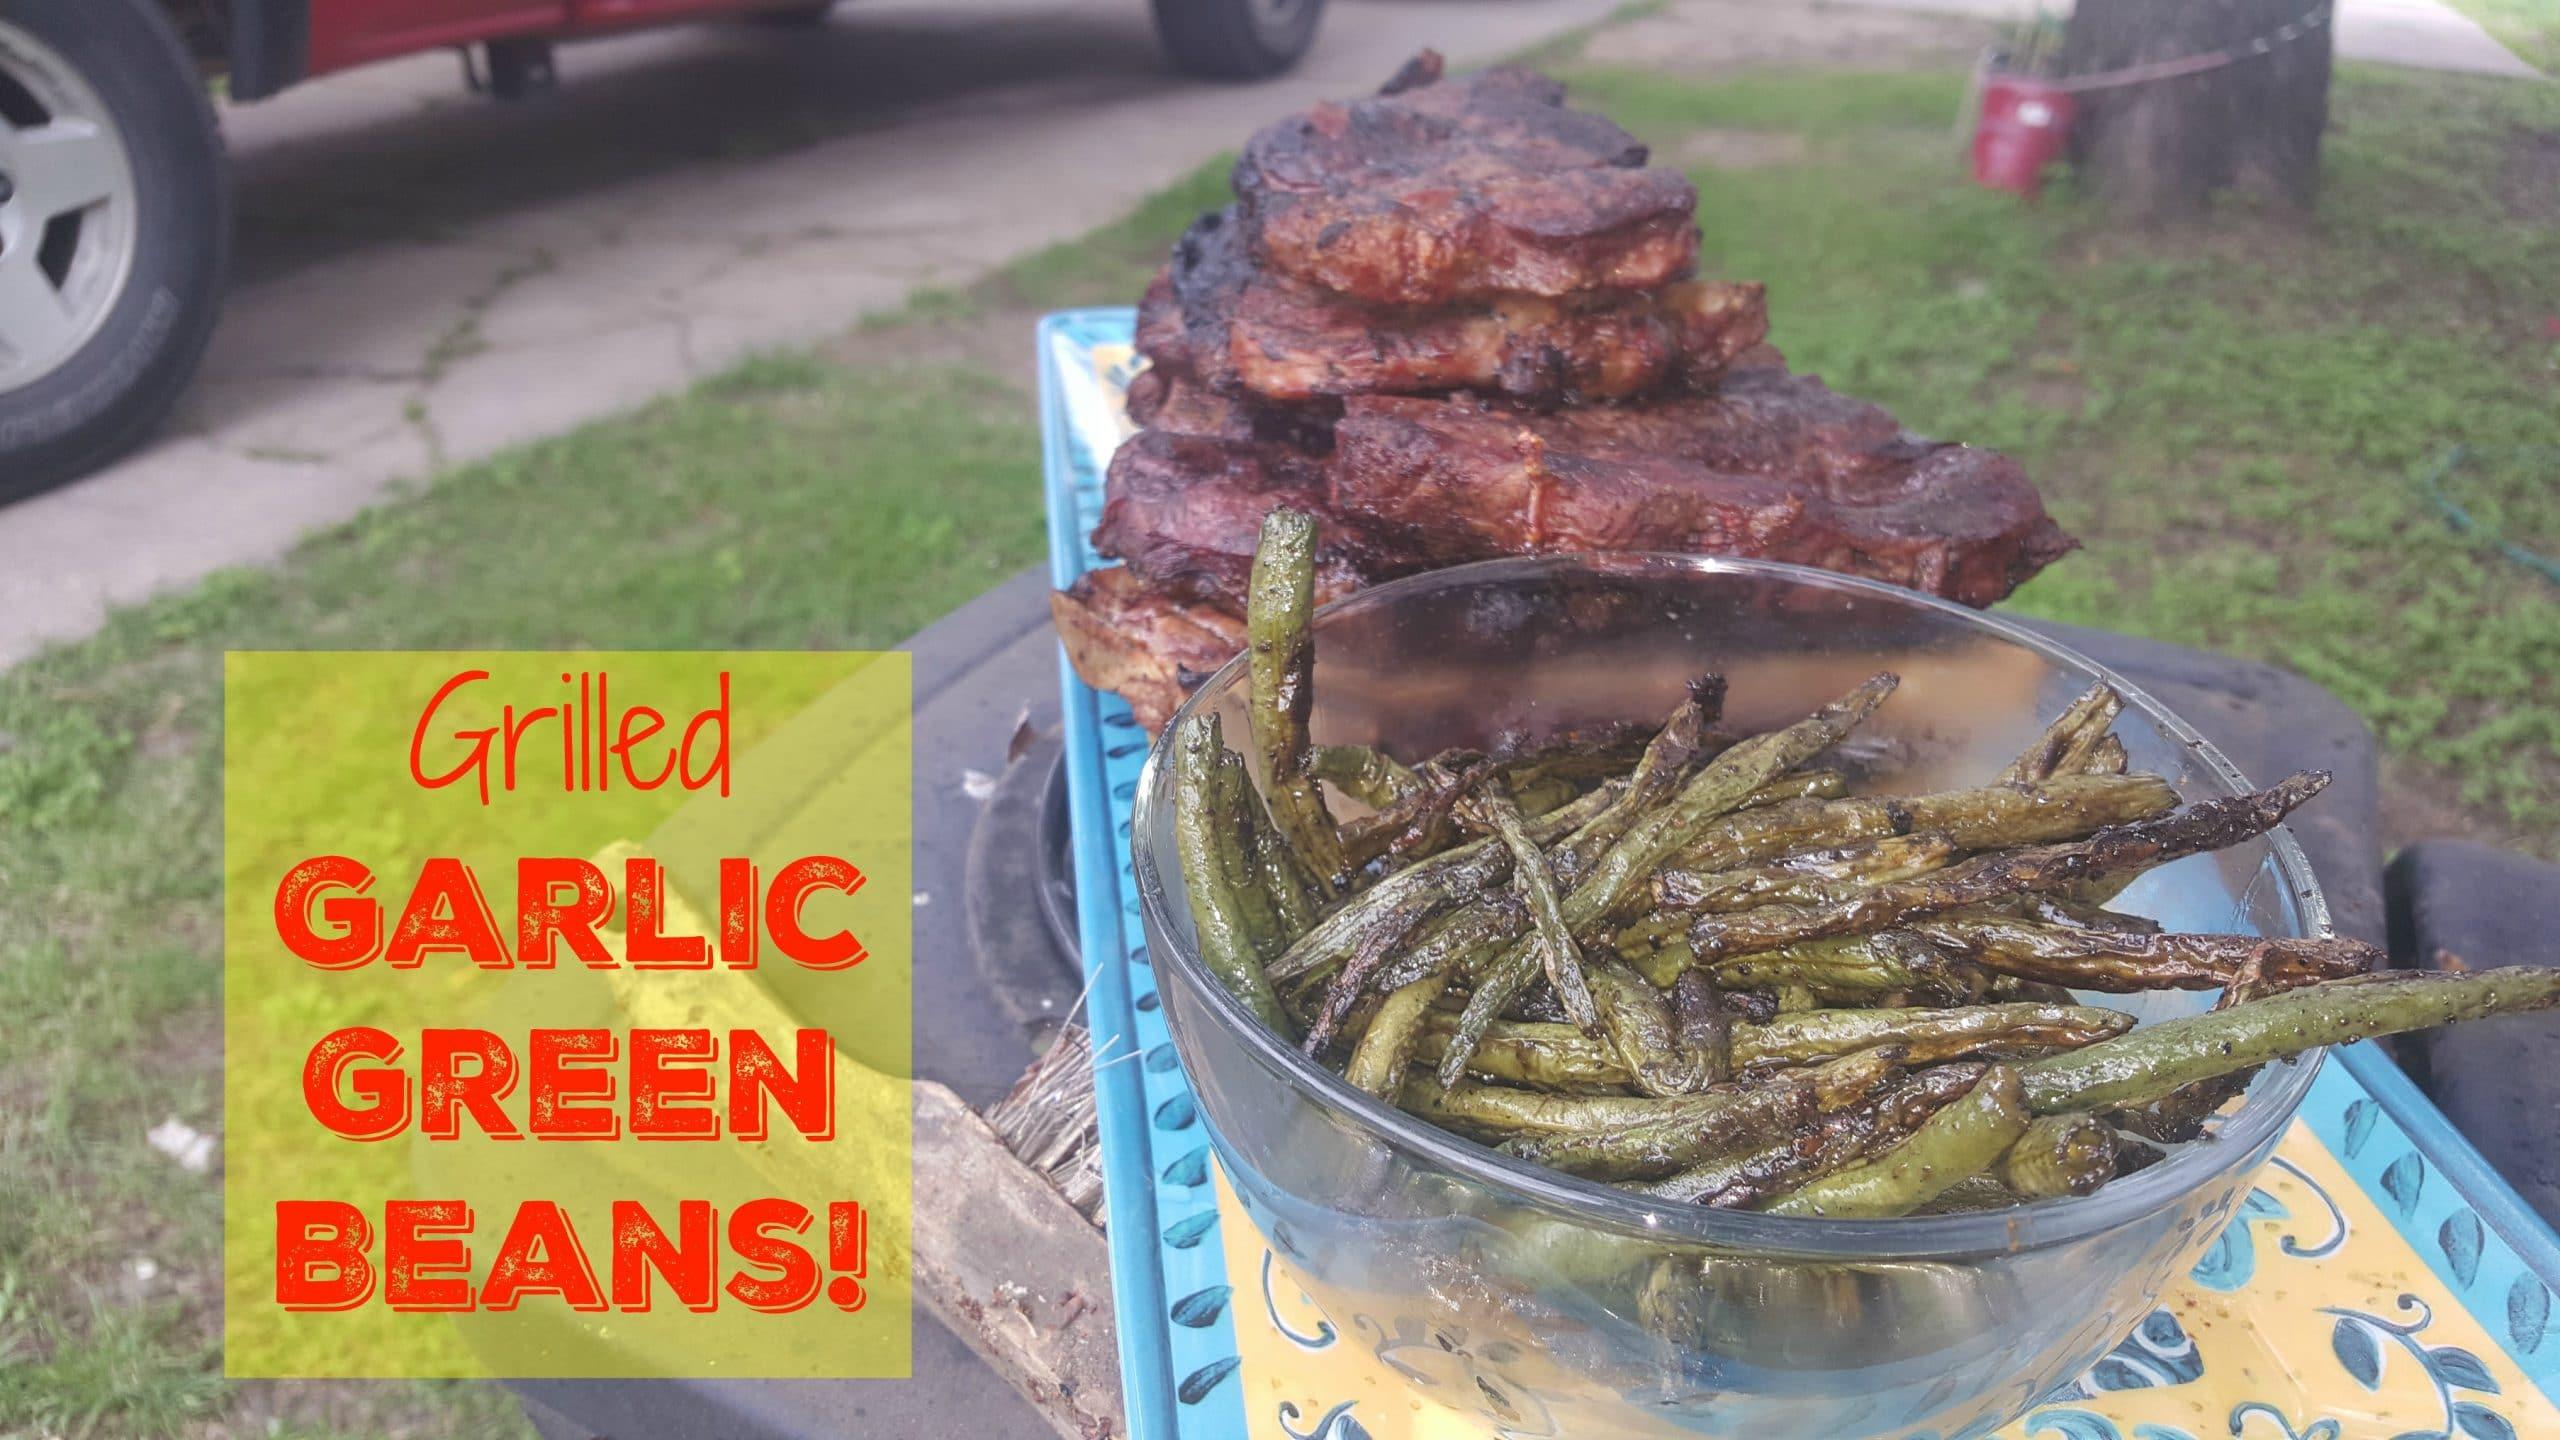 Grilled Garlic Green Beans Recipe!